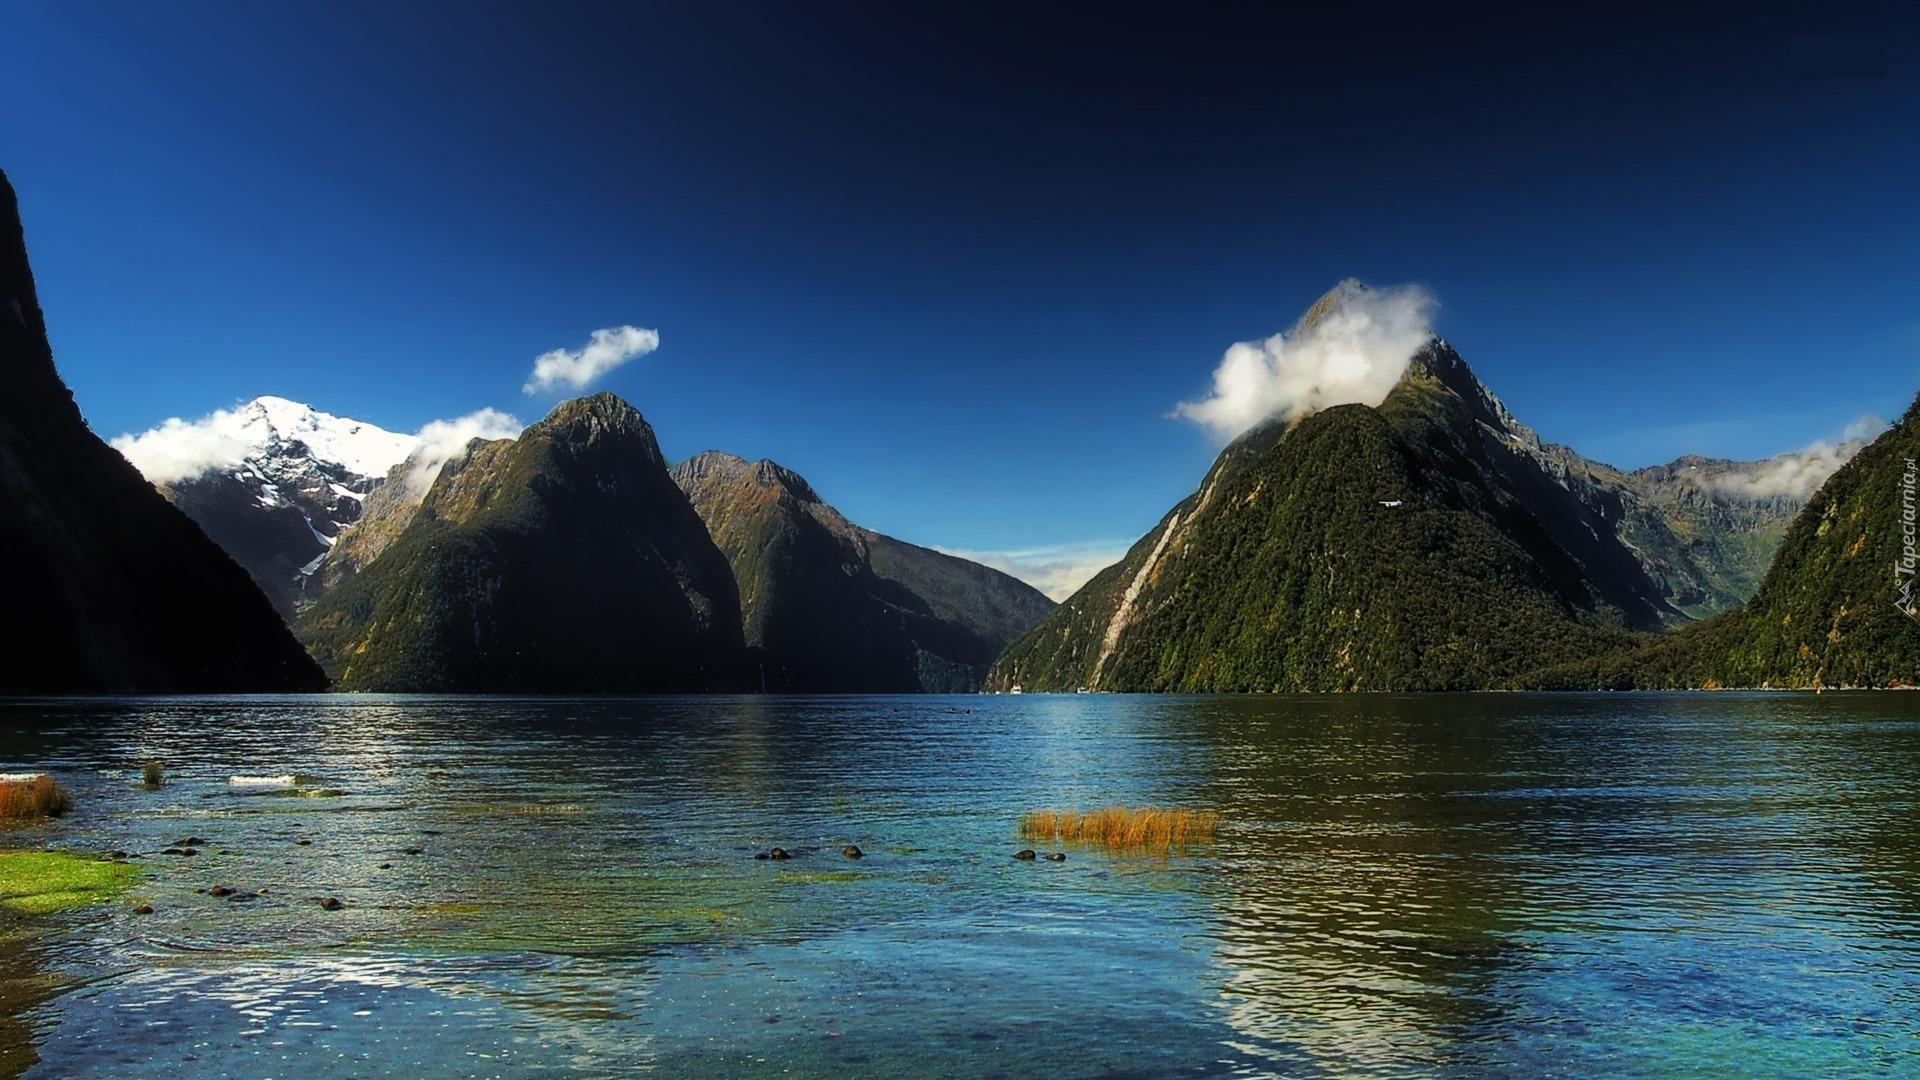 Zamach Nowa Zelandia Picture: Góry, Morze, Nowa Zelandia